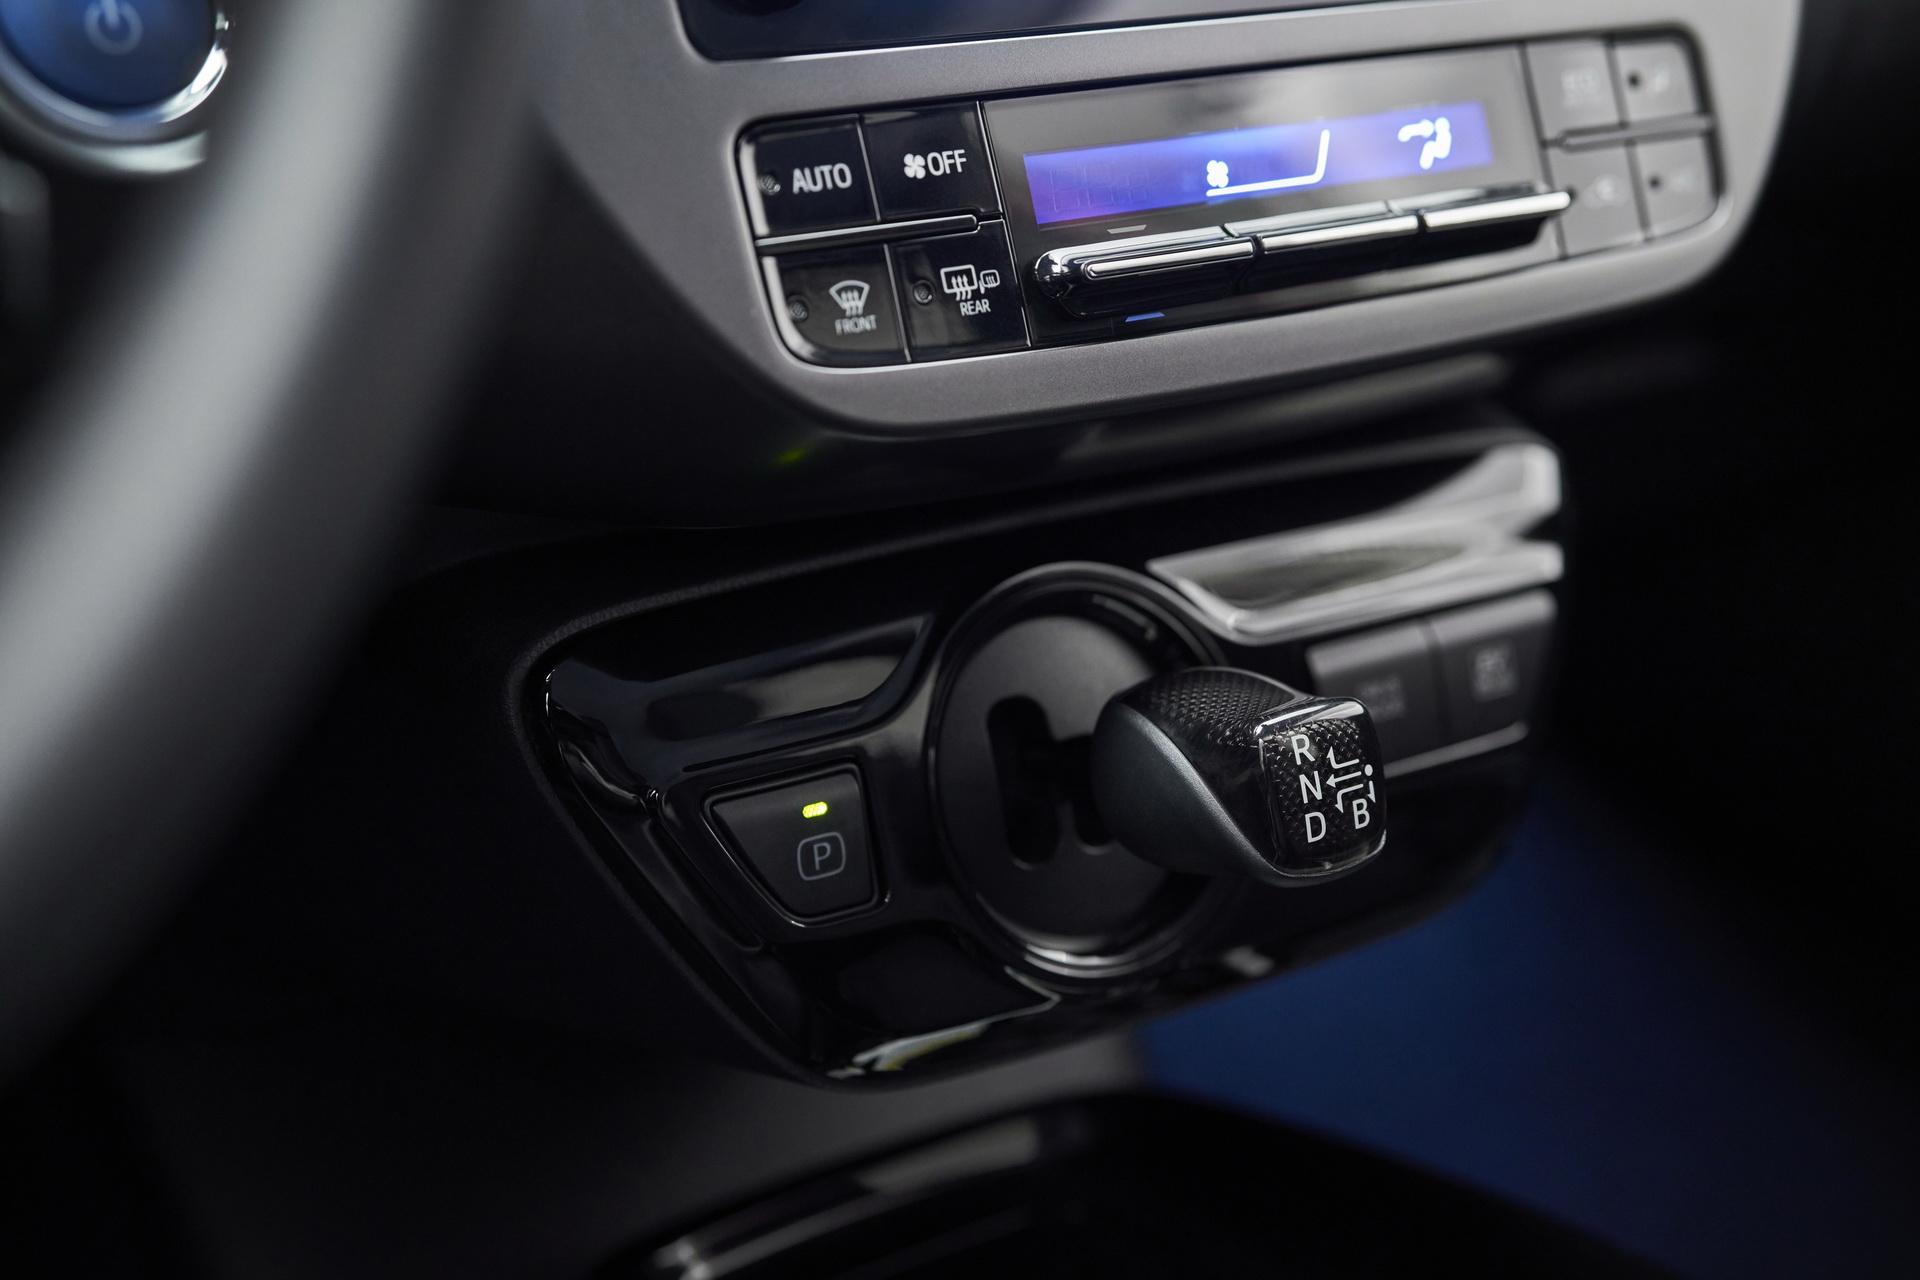 Toyota-Prius-2020-Edition-7